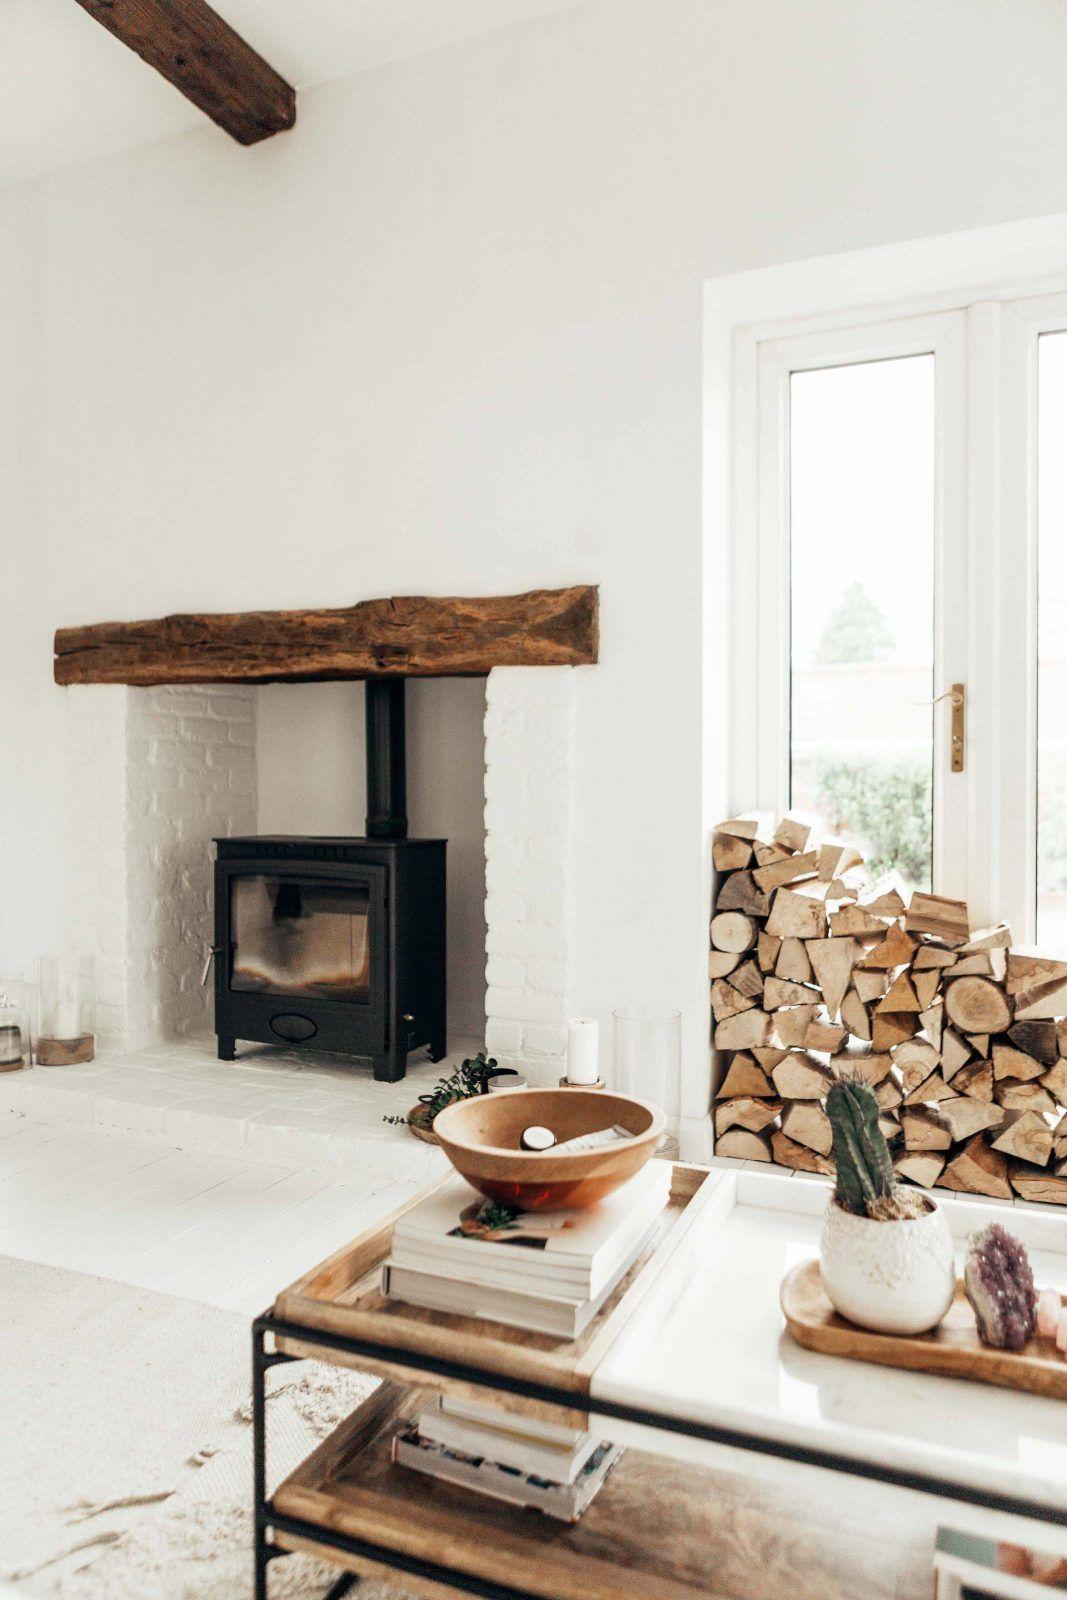 HOW TO PAINT A BRICK FIREPLACE WHITE #whitebrickfireplace